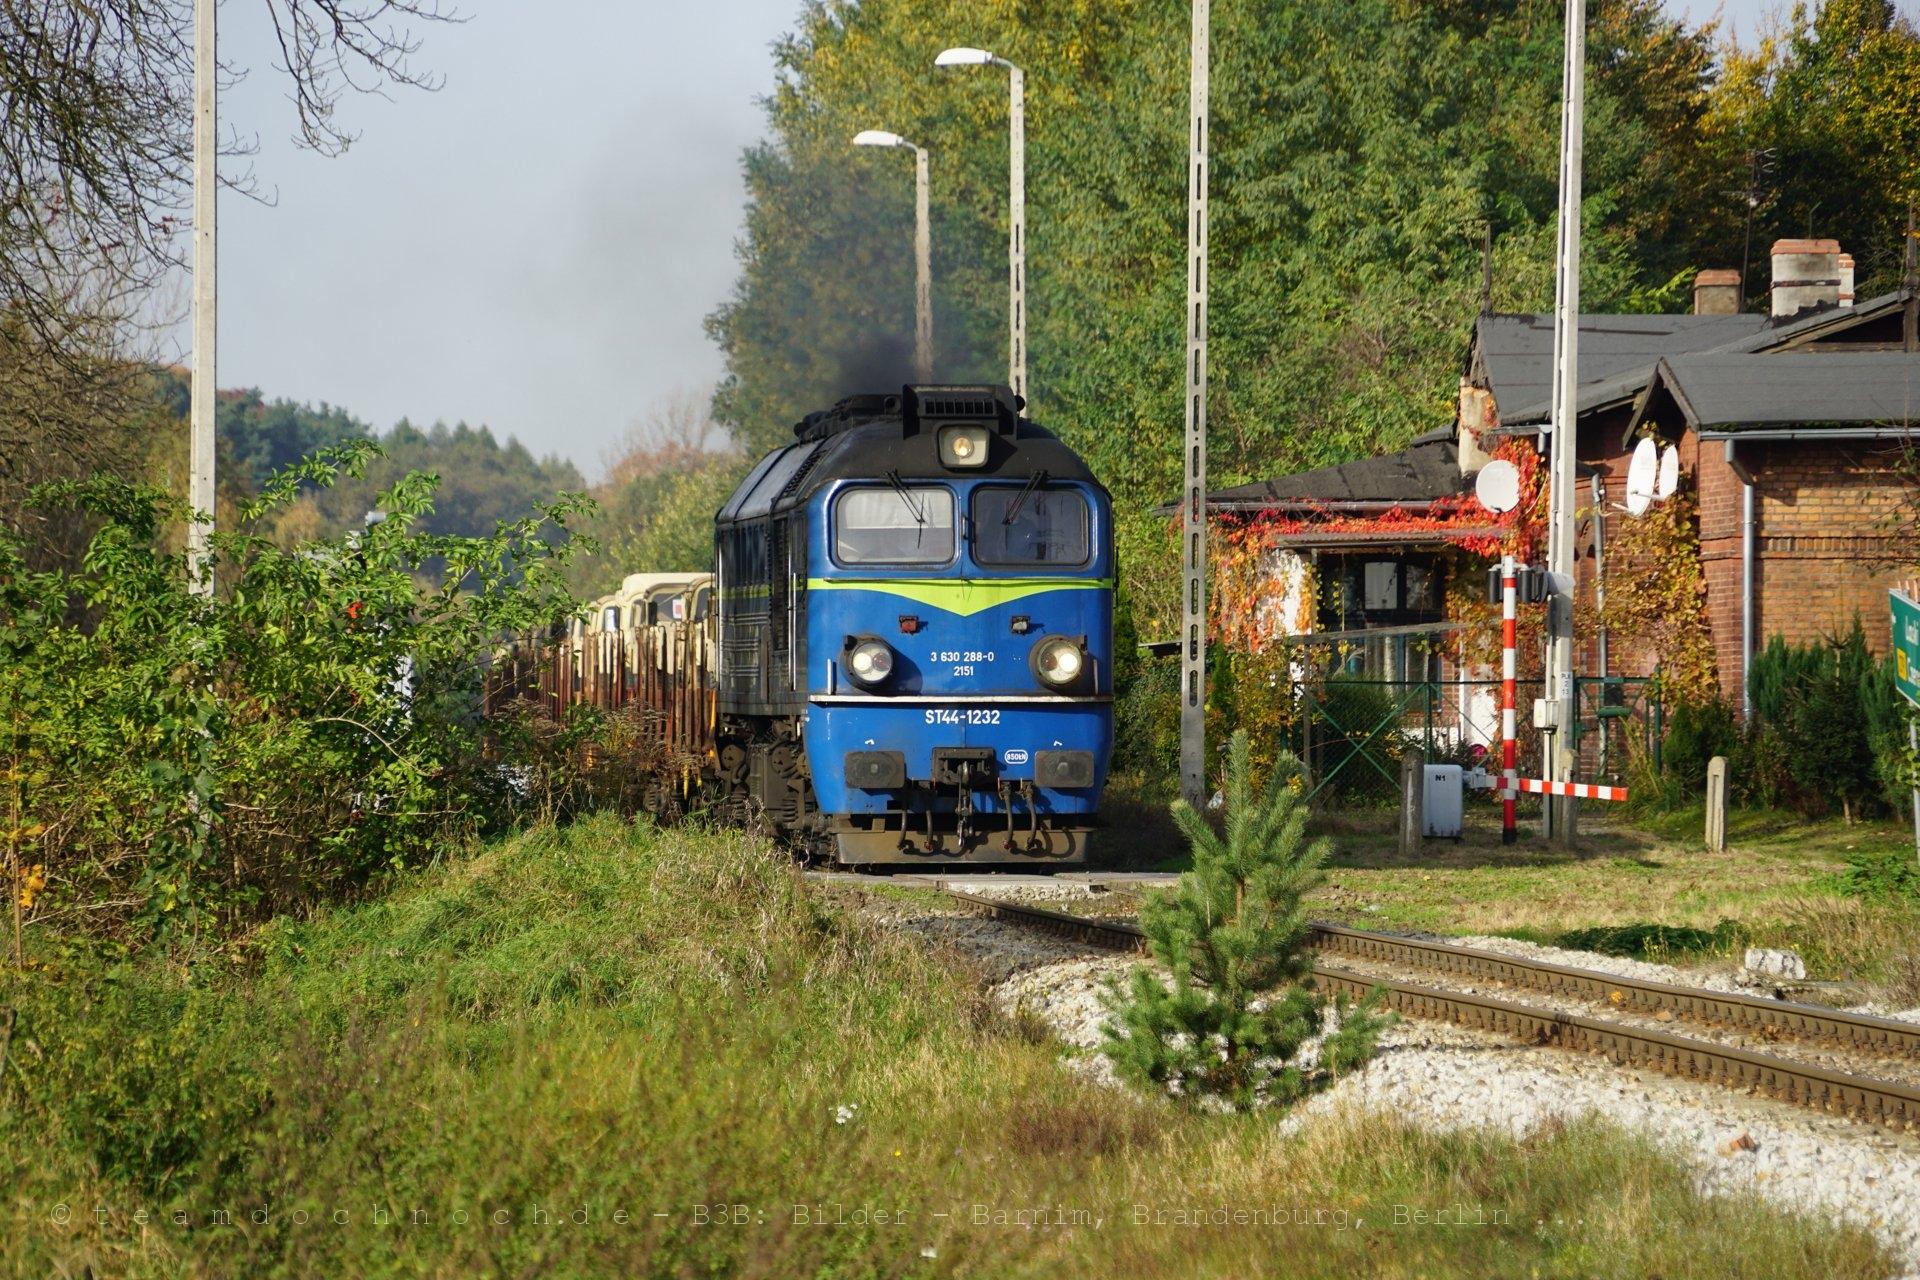 ST44-1232 am Bahnhof Nietków